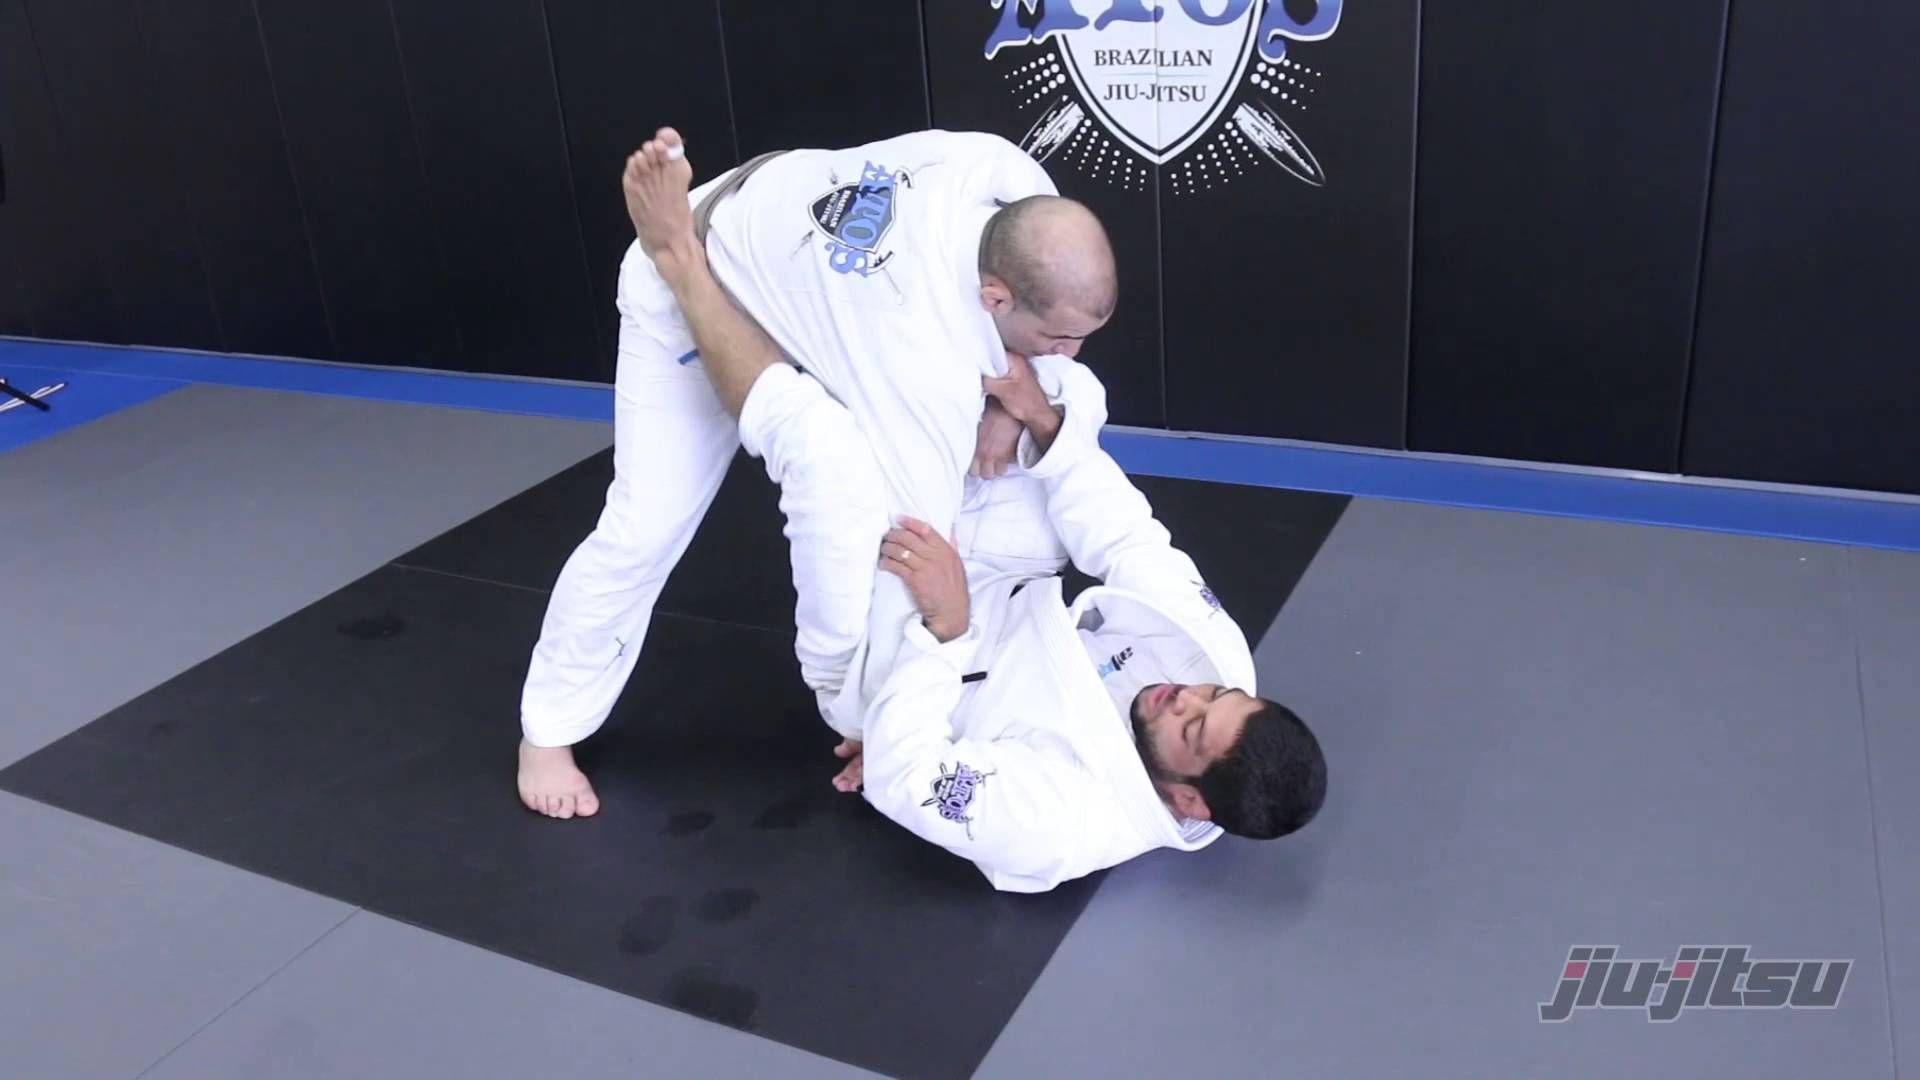 Andre Galvao Lasso Guard Sweep With Omoplata Jiu Jitsu Magazine Issue 23 Jiu Jitsu Magazine Jiu Jitsu Jiu Jitsu Techniques